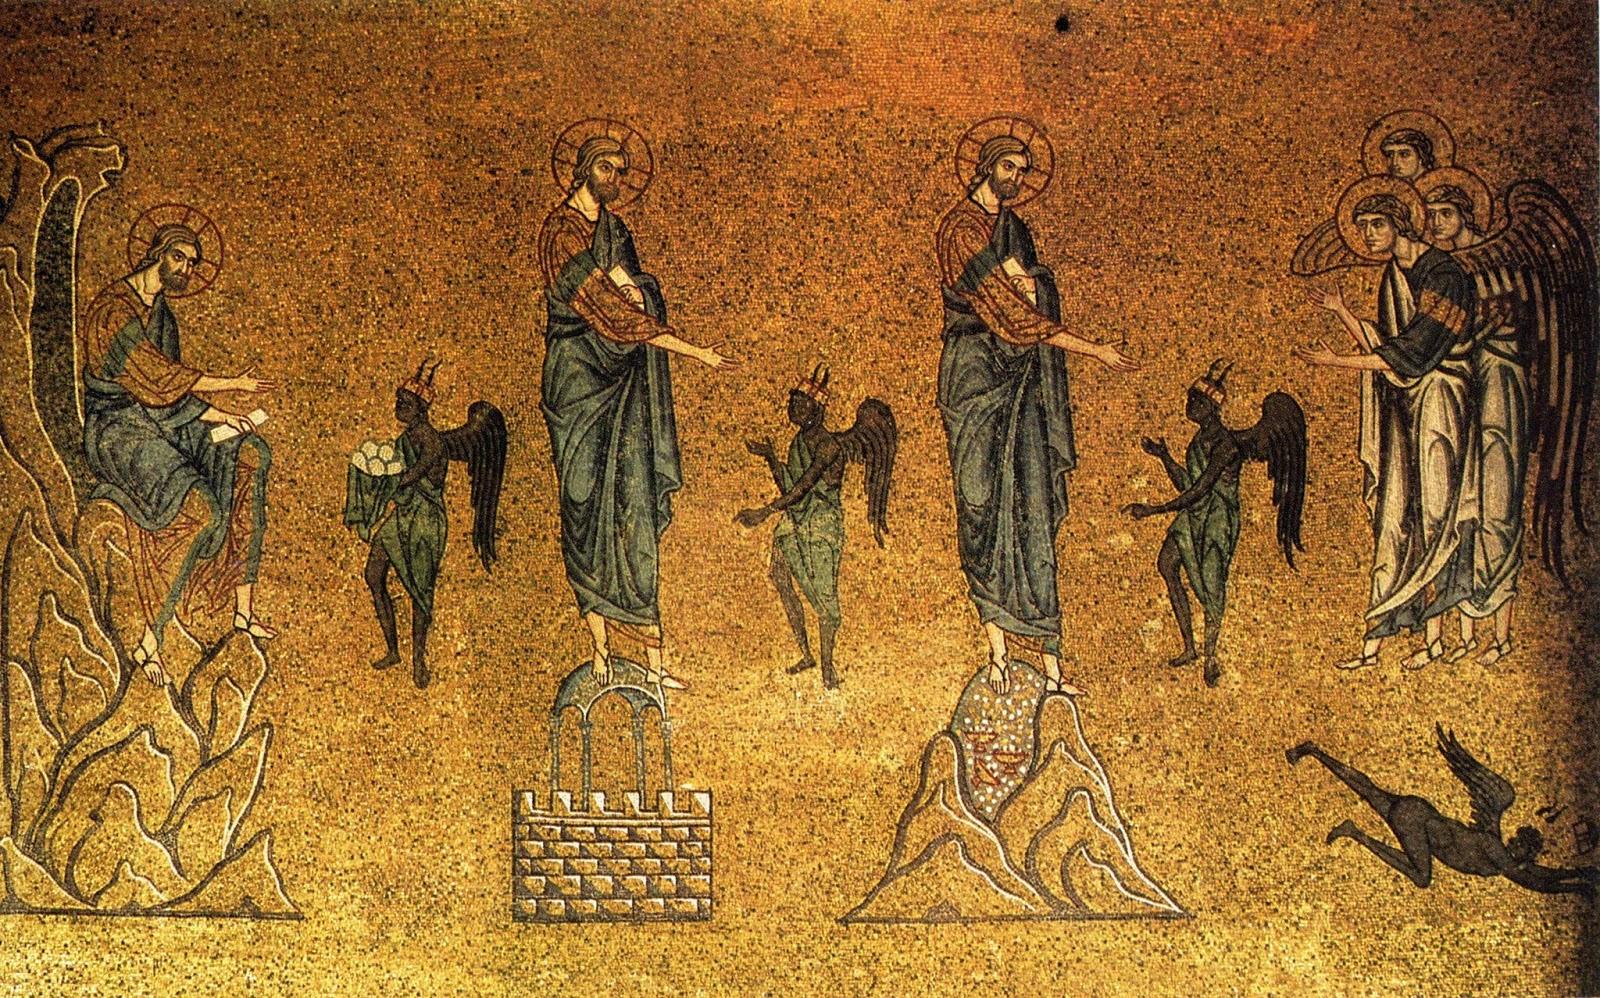 http://commons.wikimedia.org/wiki/Gospel_harmony